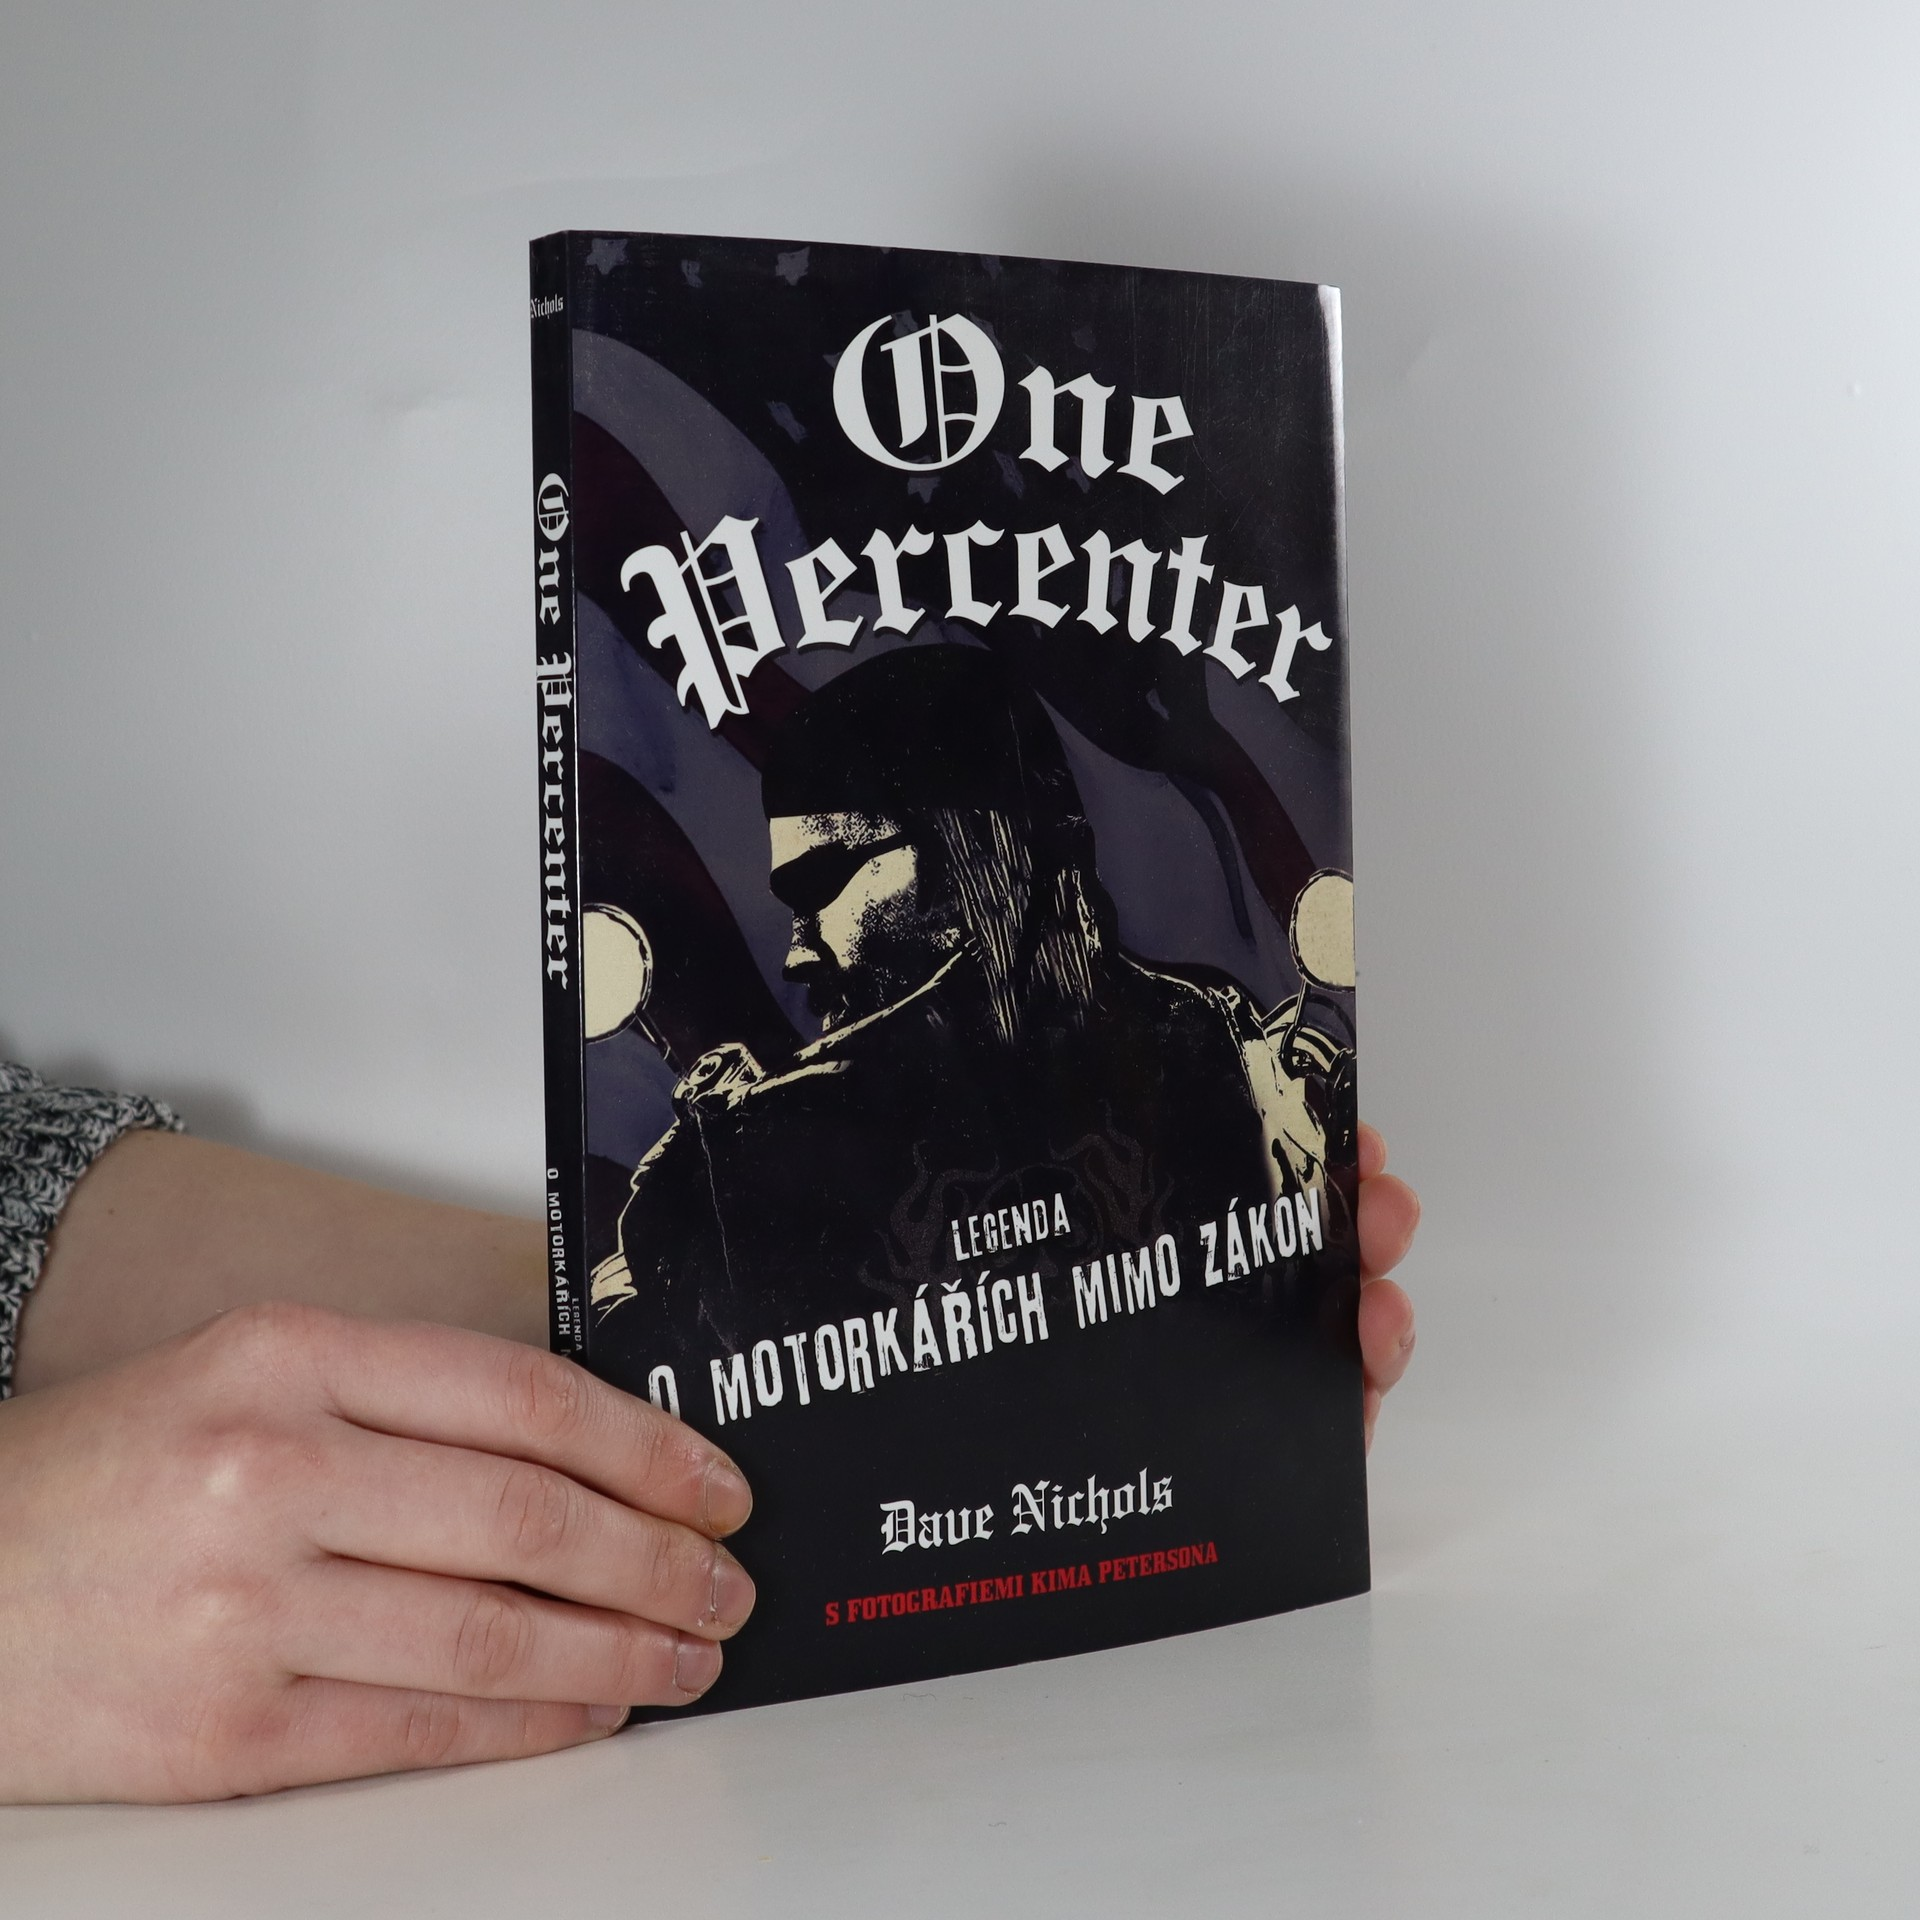 antikvární kniha One percenter. Legenda o motorkářích mimo zákon, neuveden